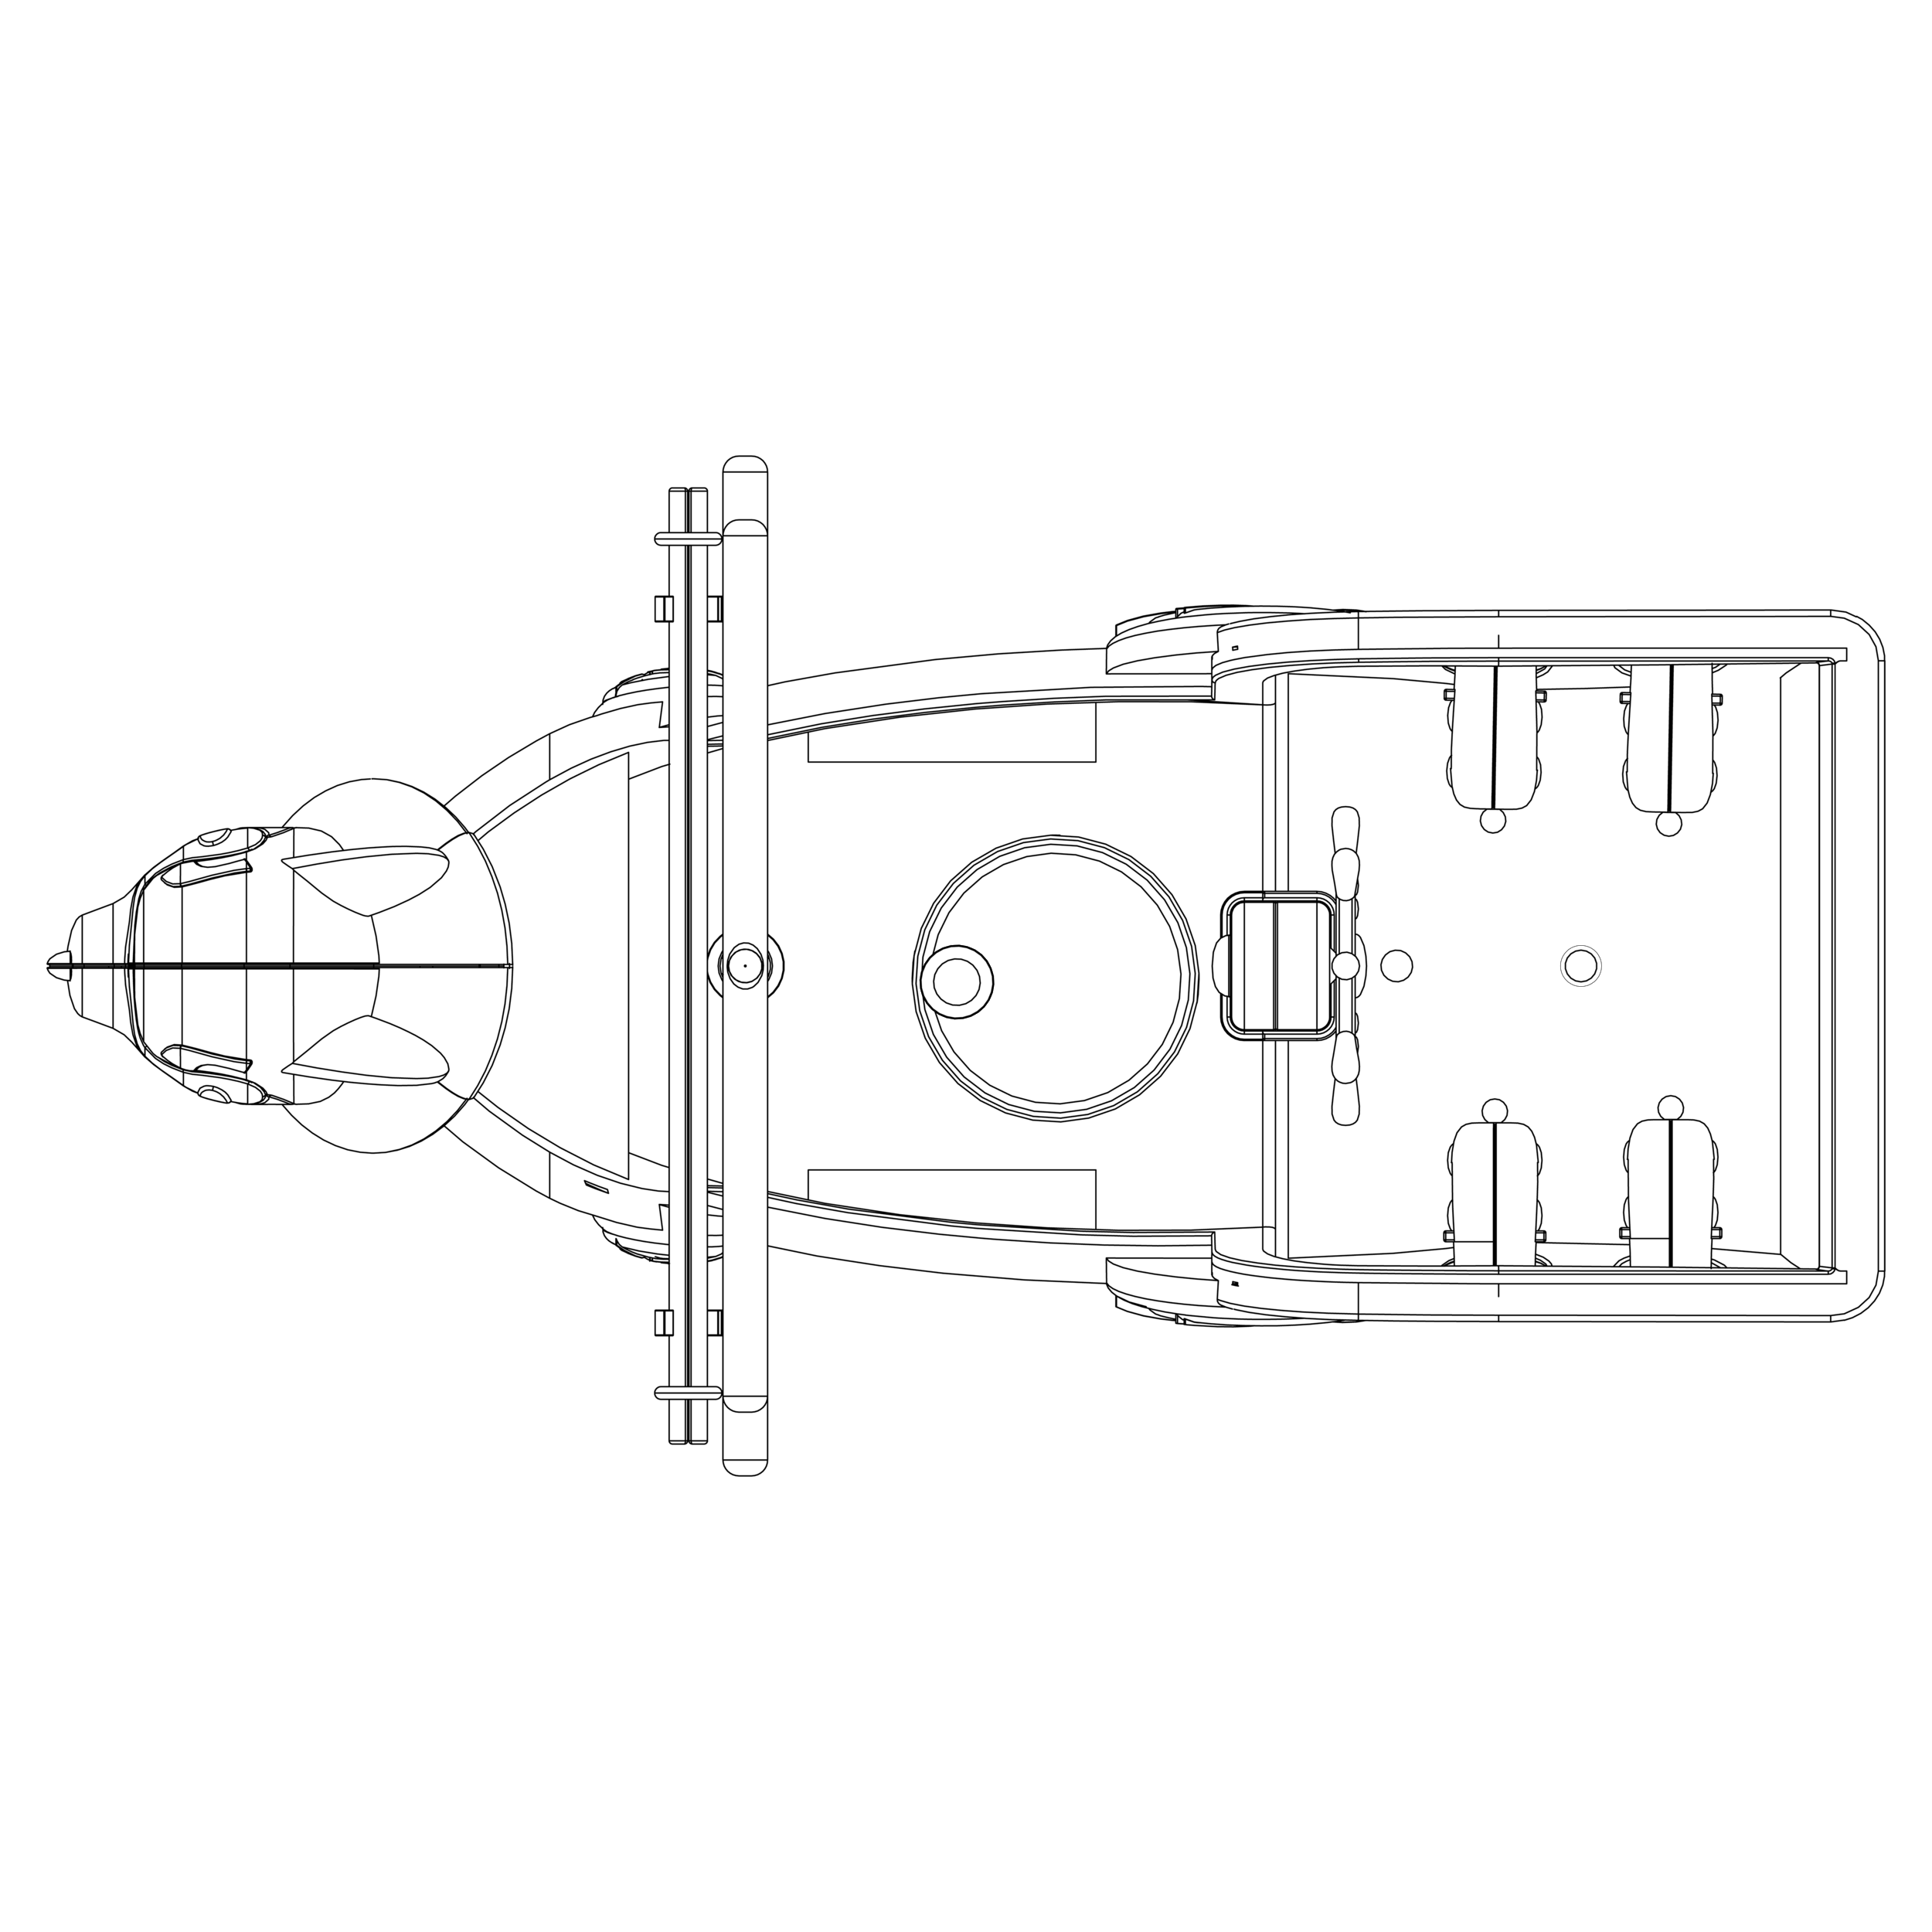 Panda Joy Orthographic-04.png